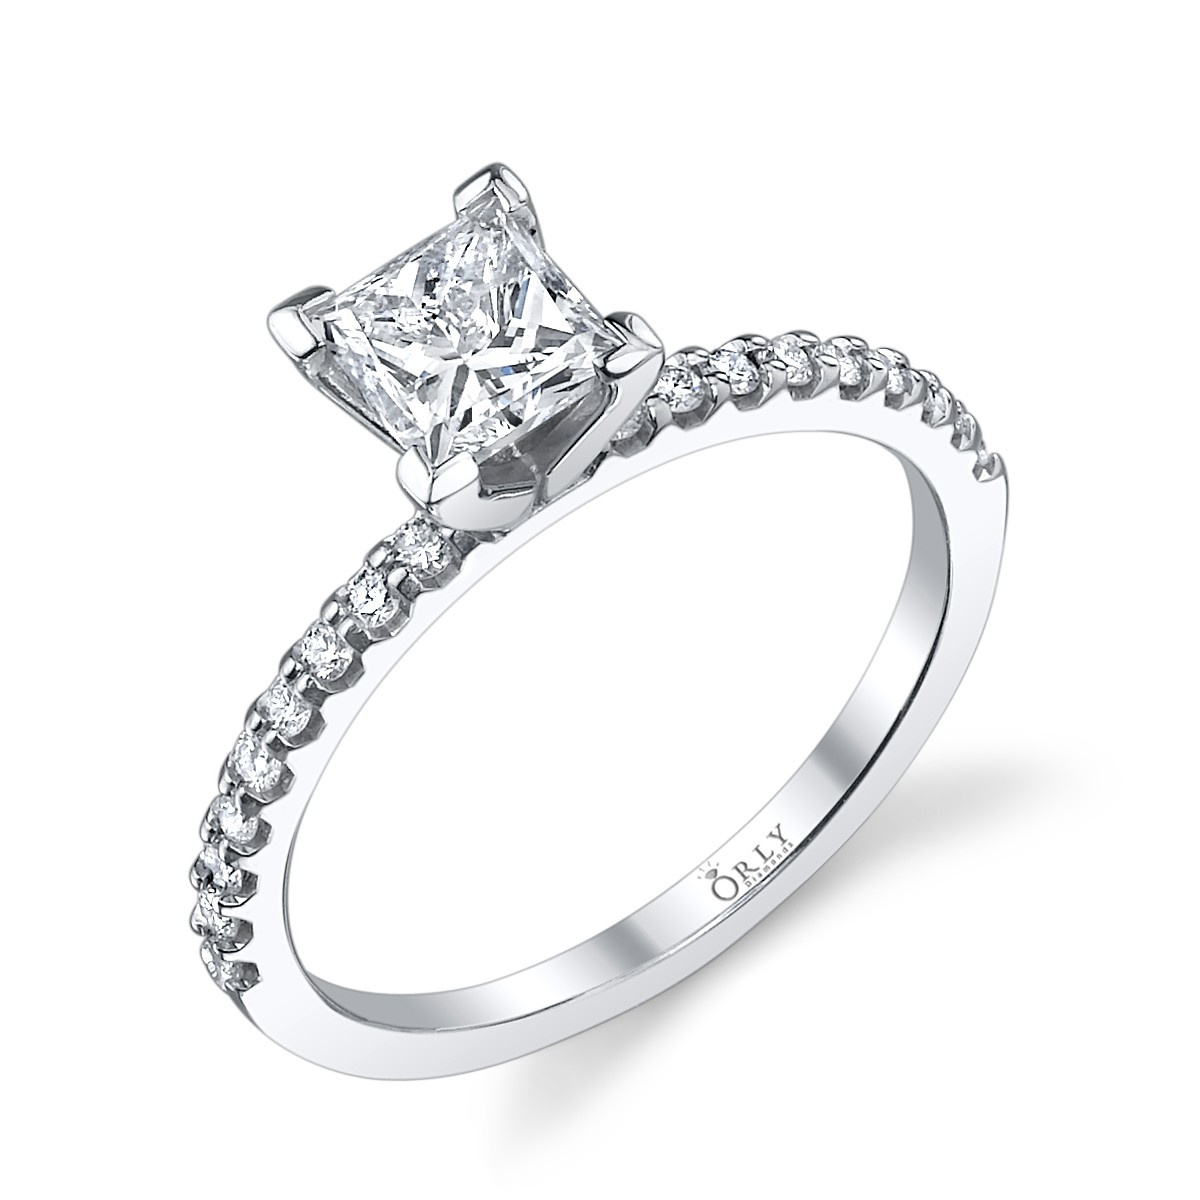 Radiant Cut Diamond with Diamonds Shank 1.38 carats tw